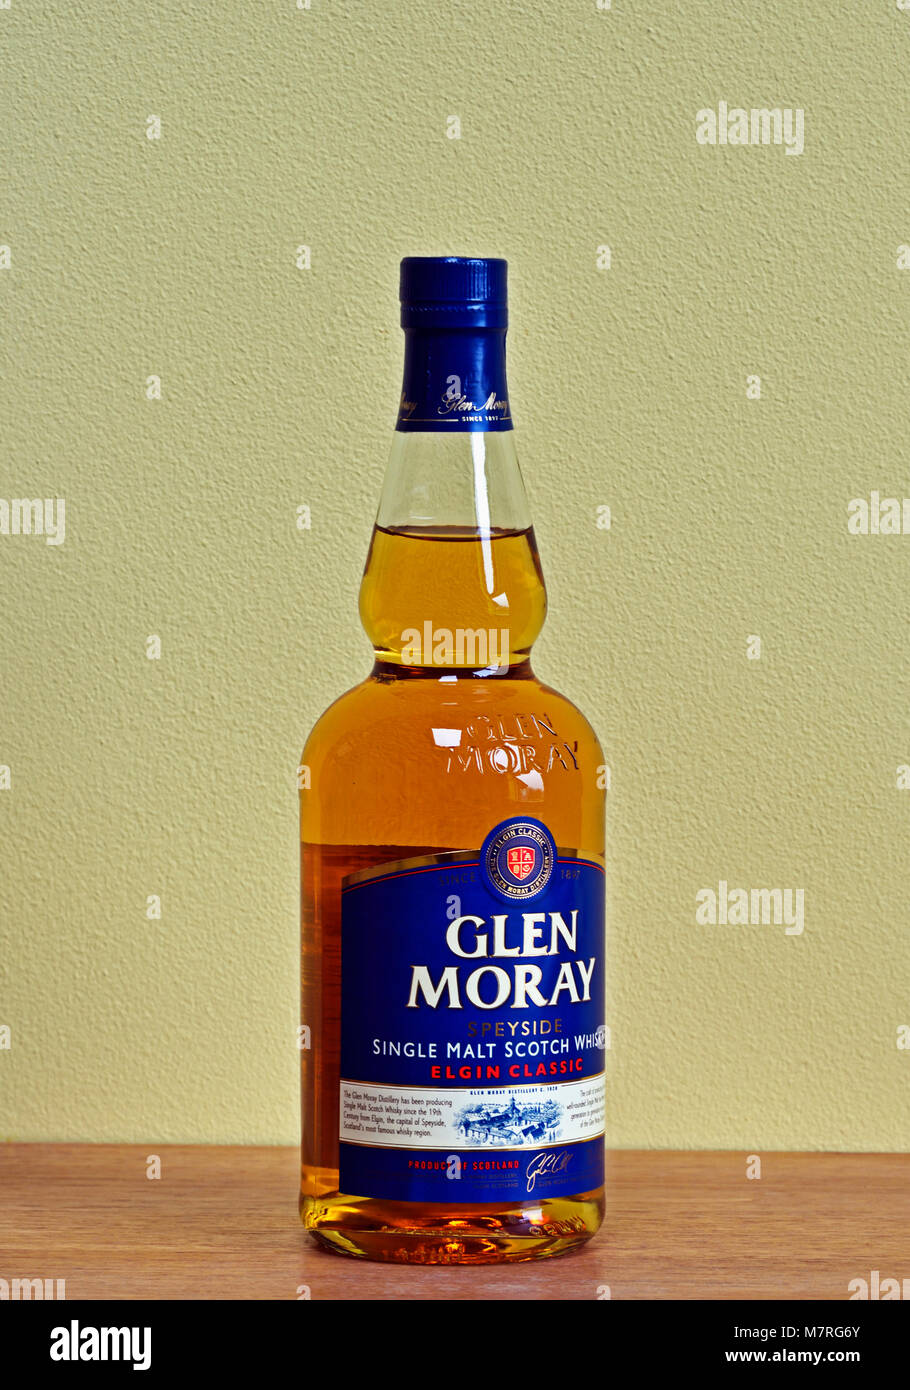 Bottle of Glen Moray Speyside single malt Scotch Whisky. Elgin Classic. - Stock Image